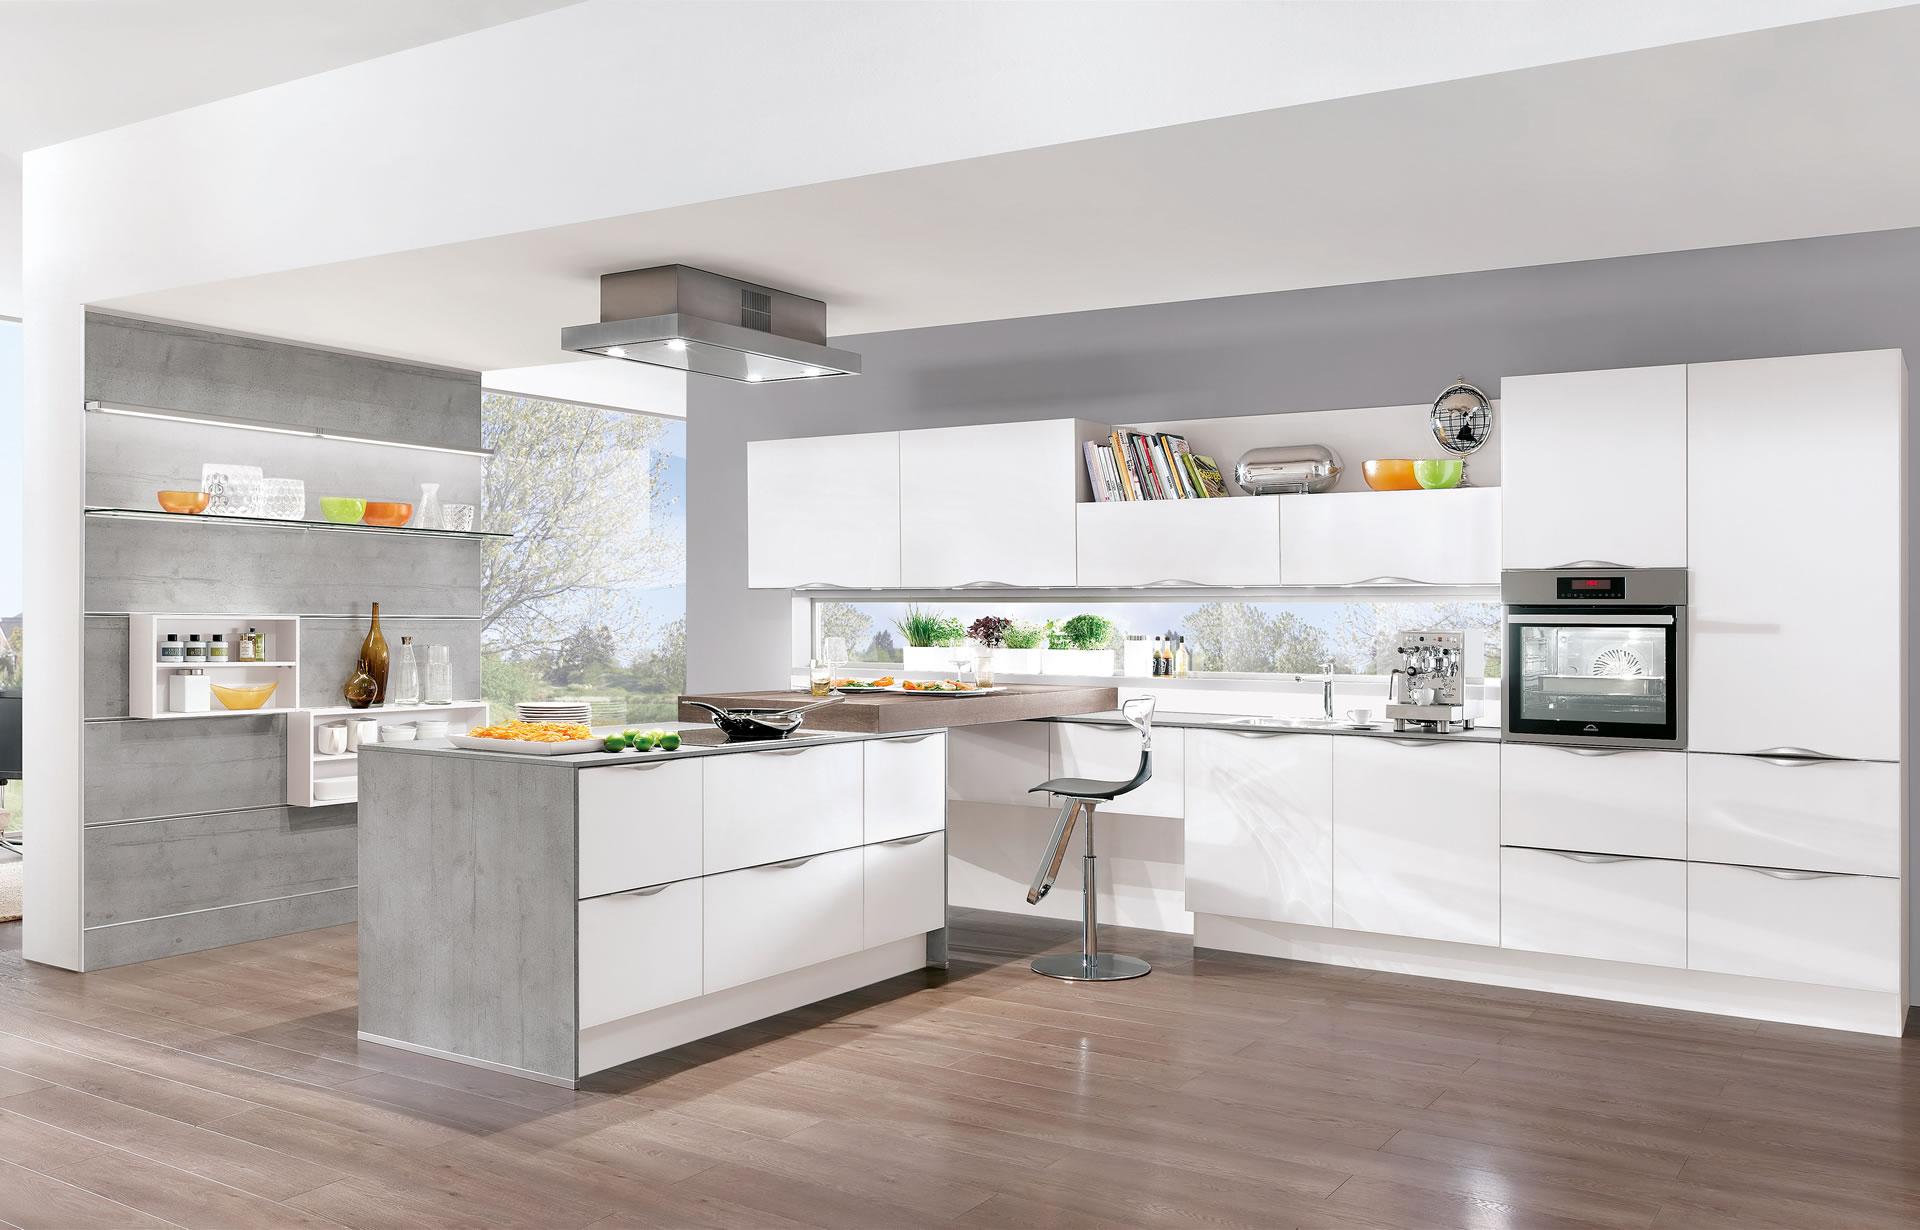 Emejing Nobilia Küchen Preisliste Pictures - Home Design Ideas ...